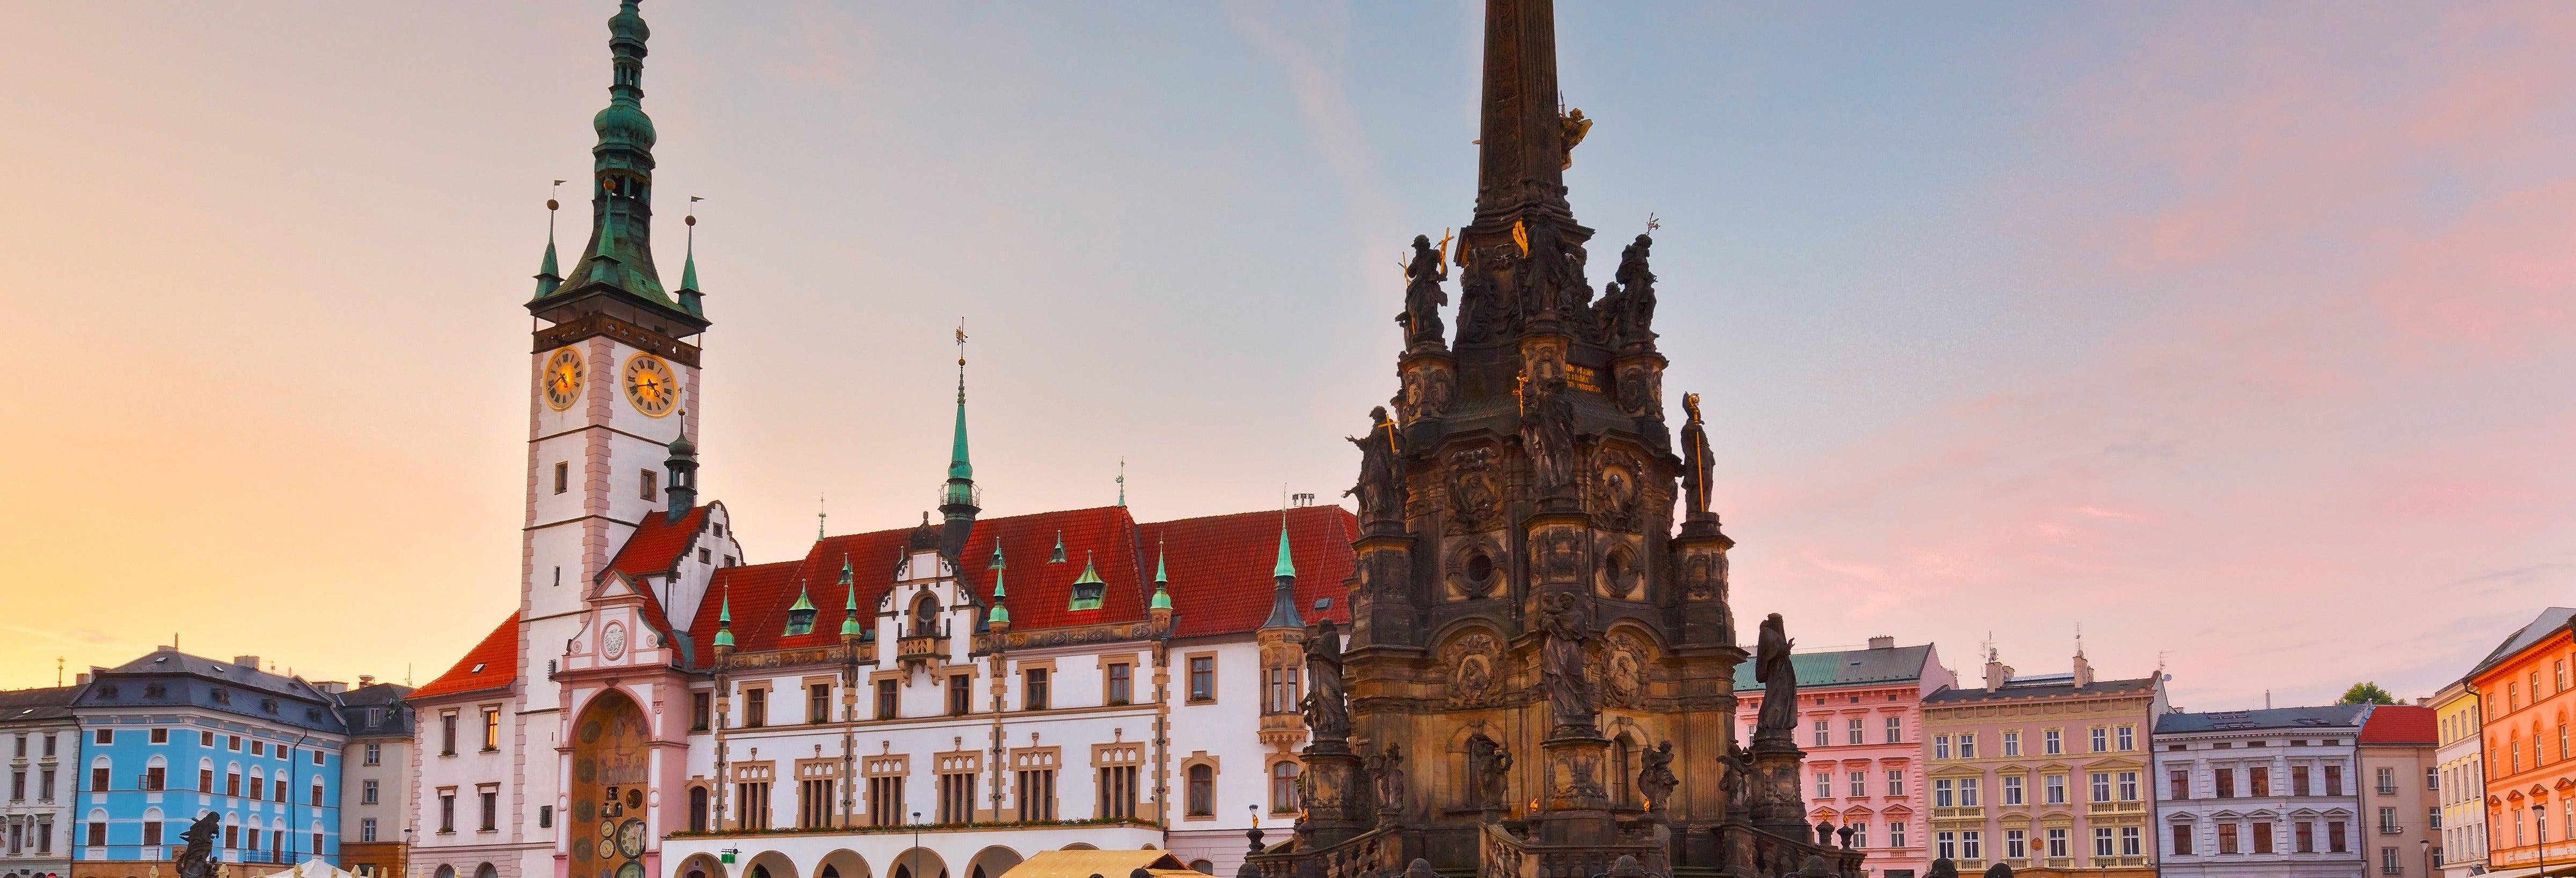 Excursão a Olomouc